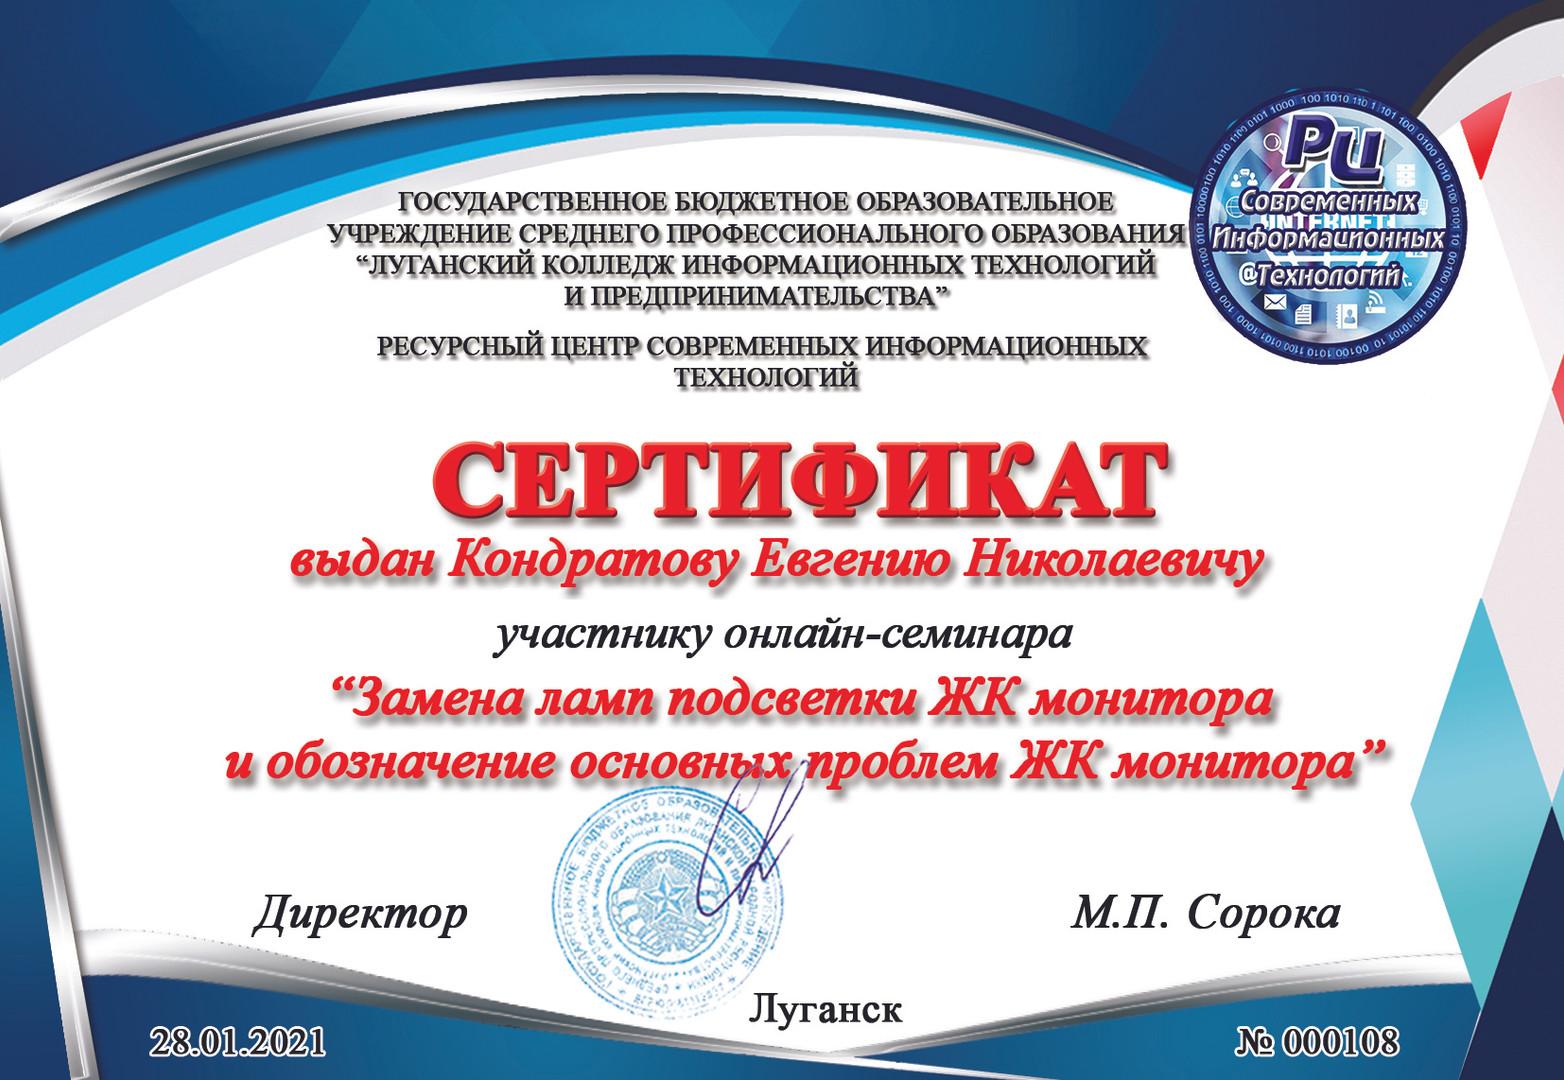 9. Кондратов Евгений Николаевич.jpg